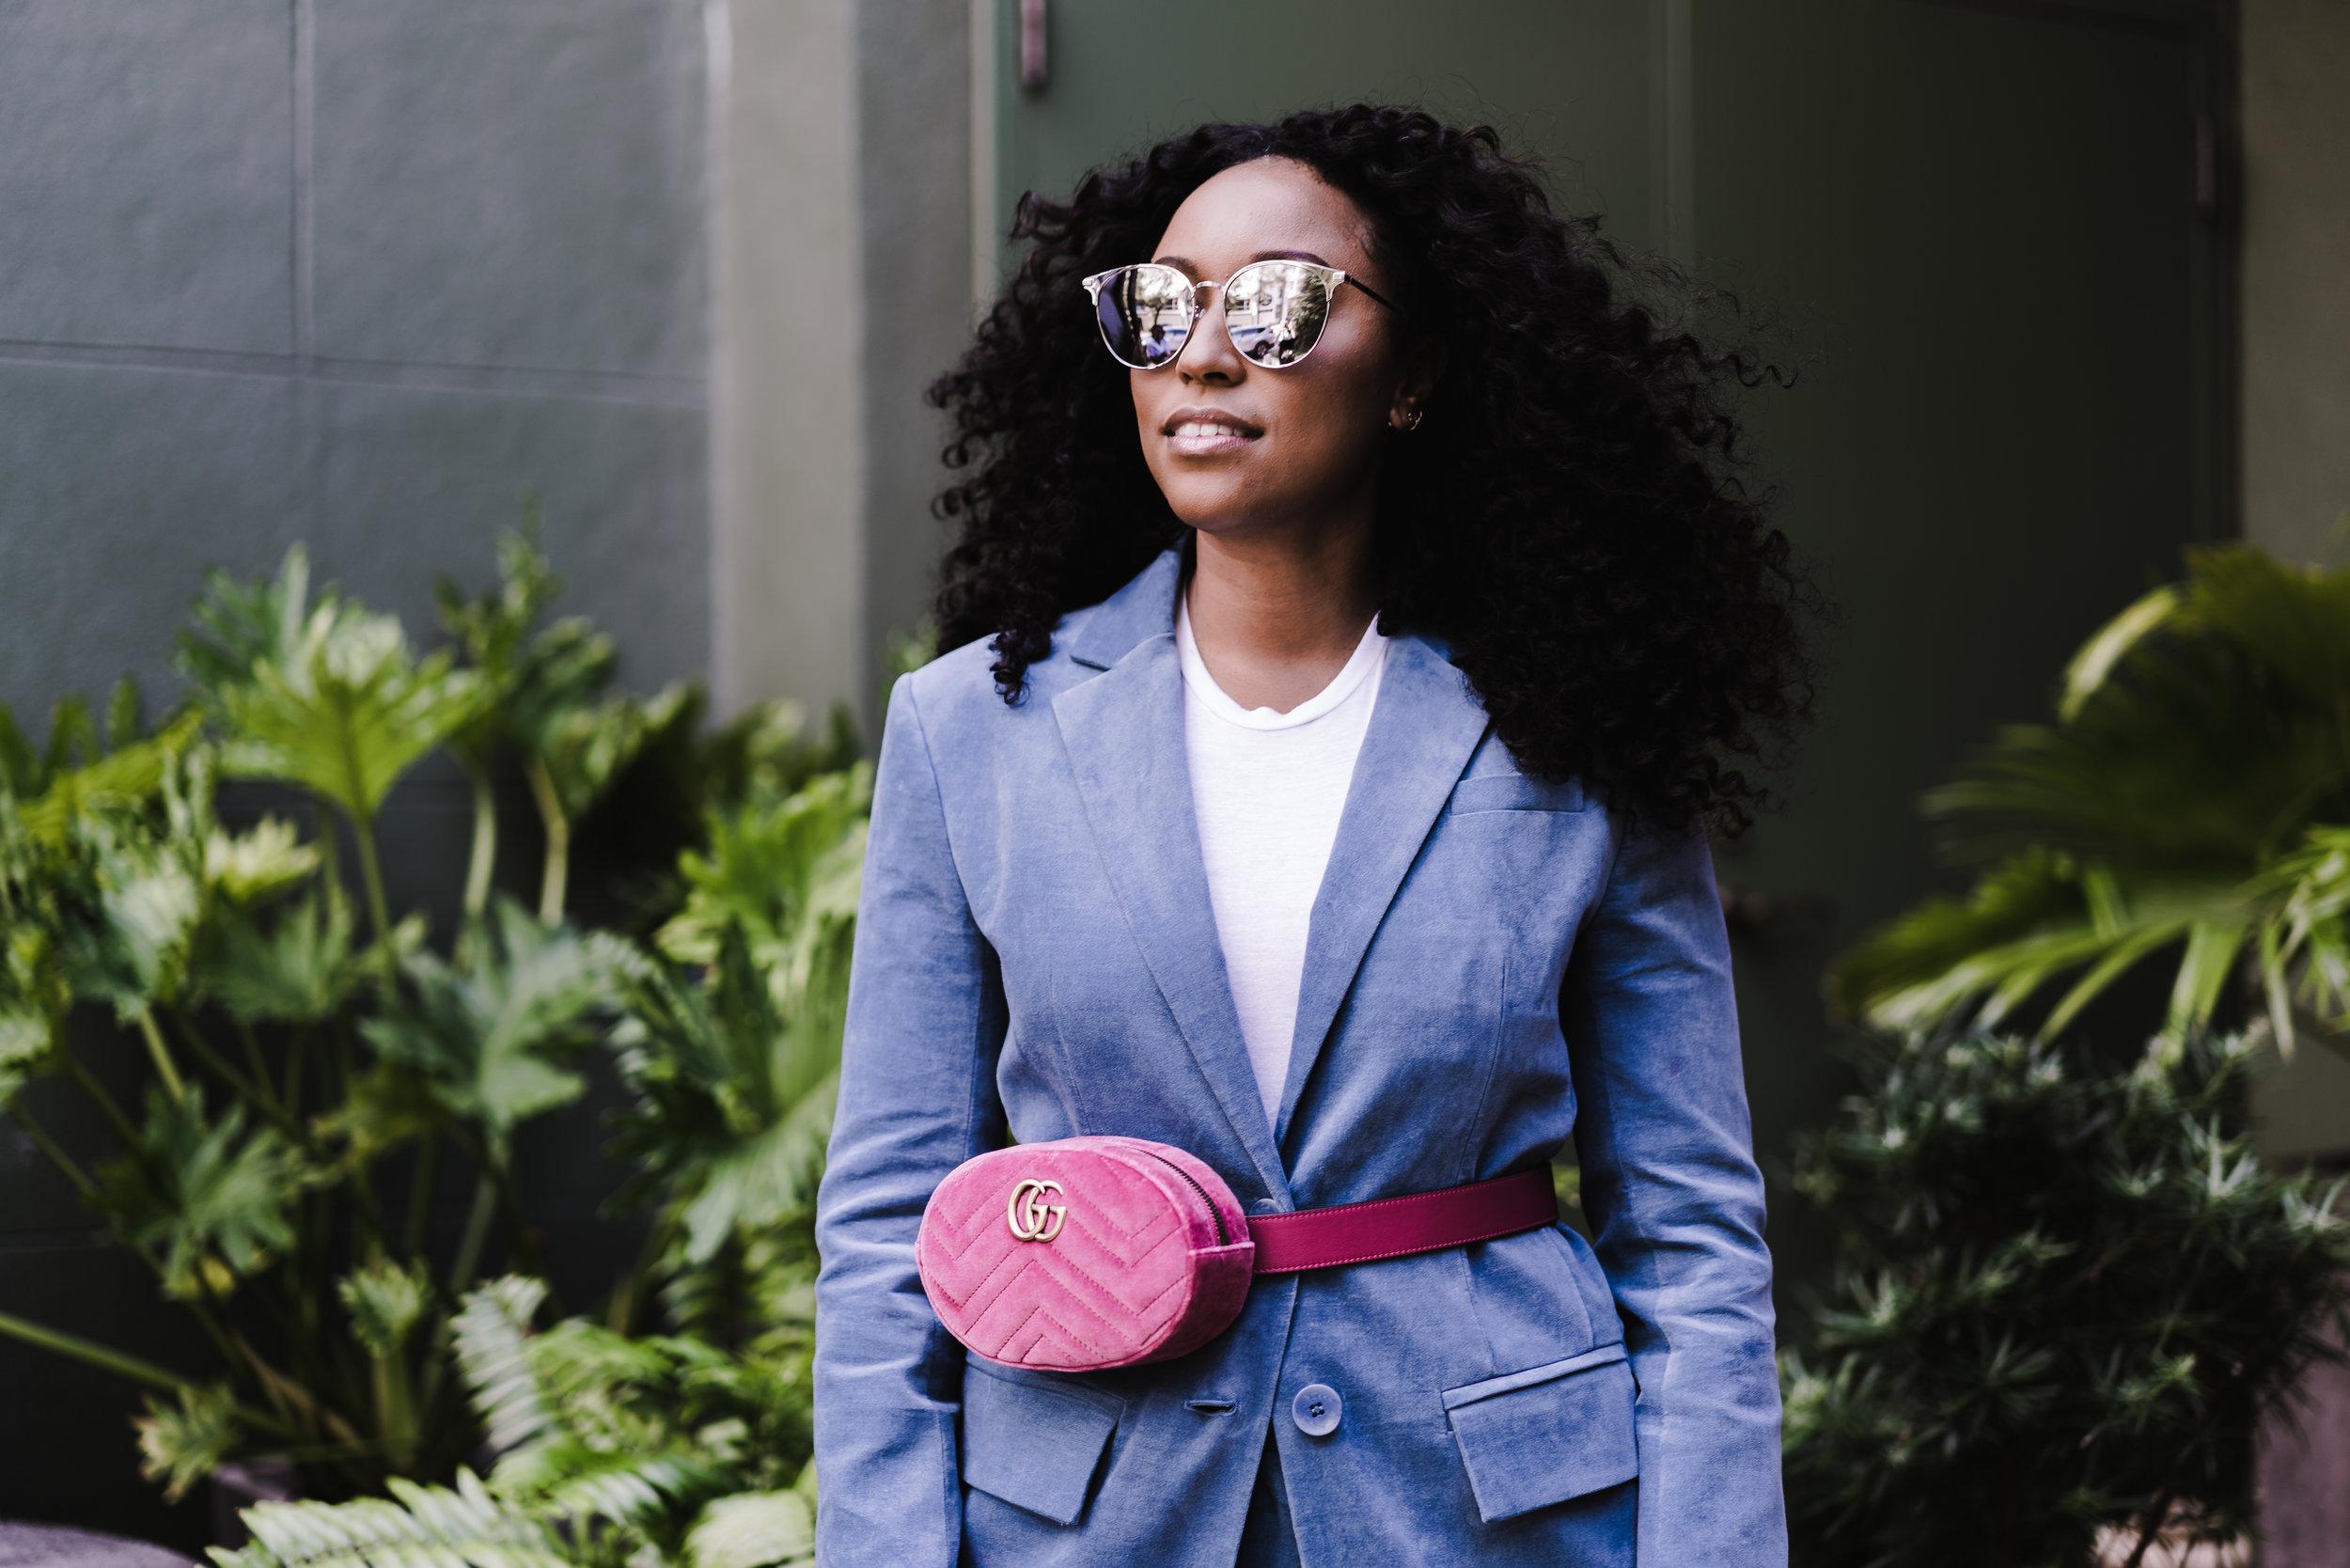 TIBI Corset-back blazer (Shop it  here ), GUCCI belt bag (Shop it  here ), SAINT LAURENT mirrored sunglasses (Shop it  here )